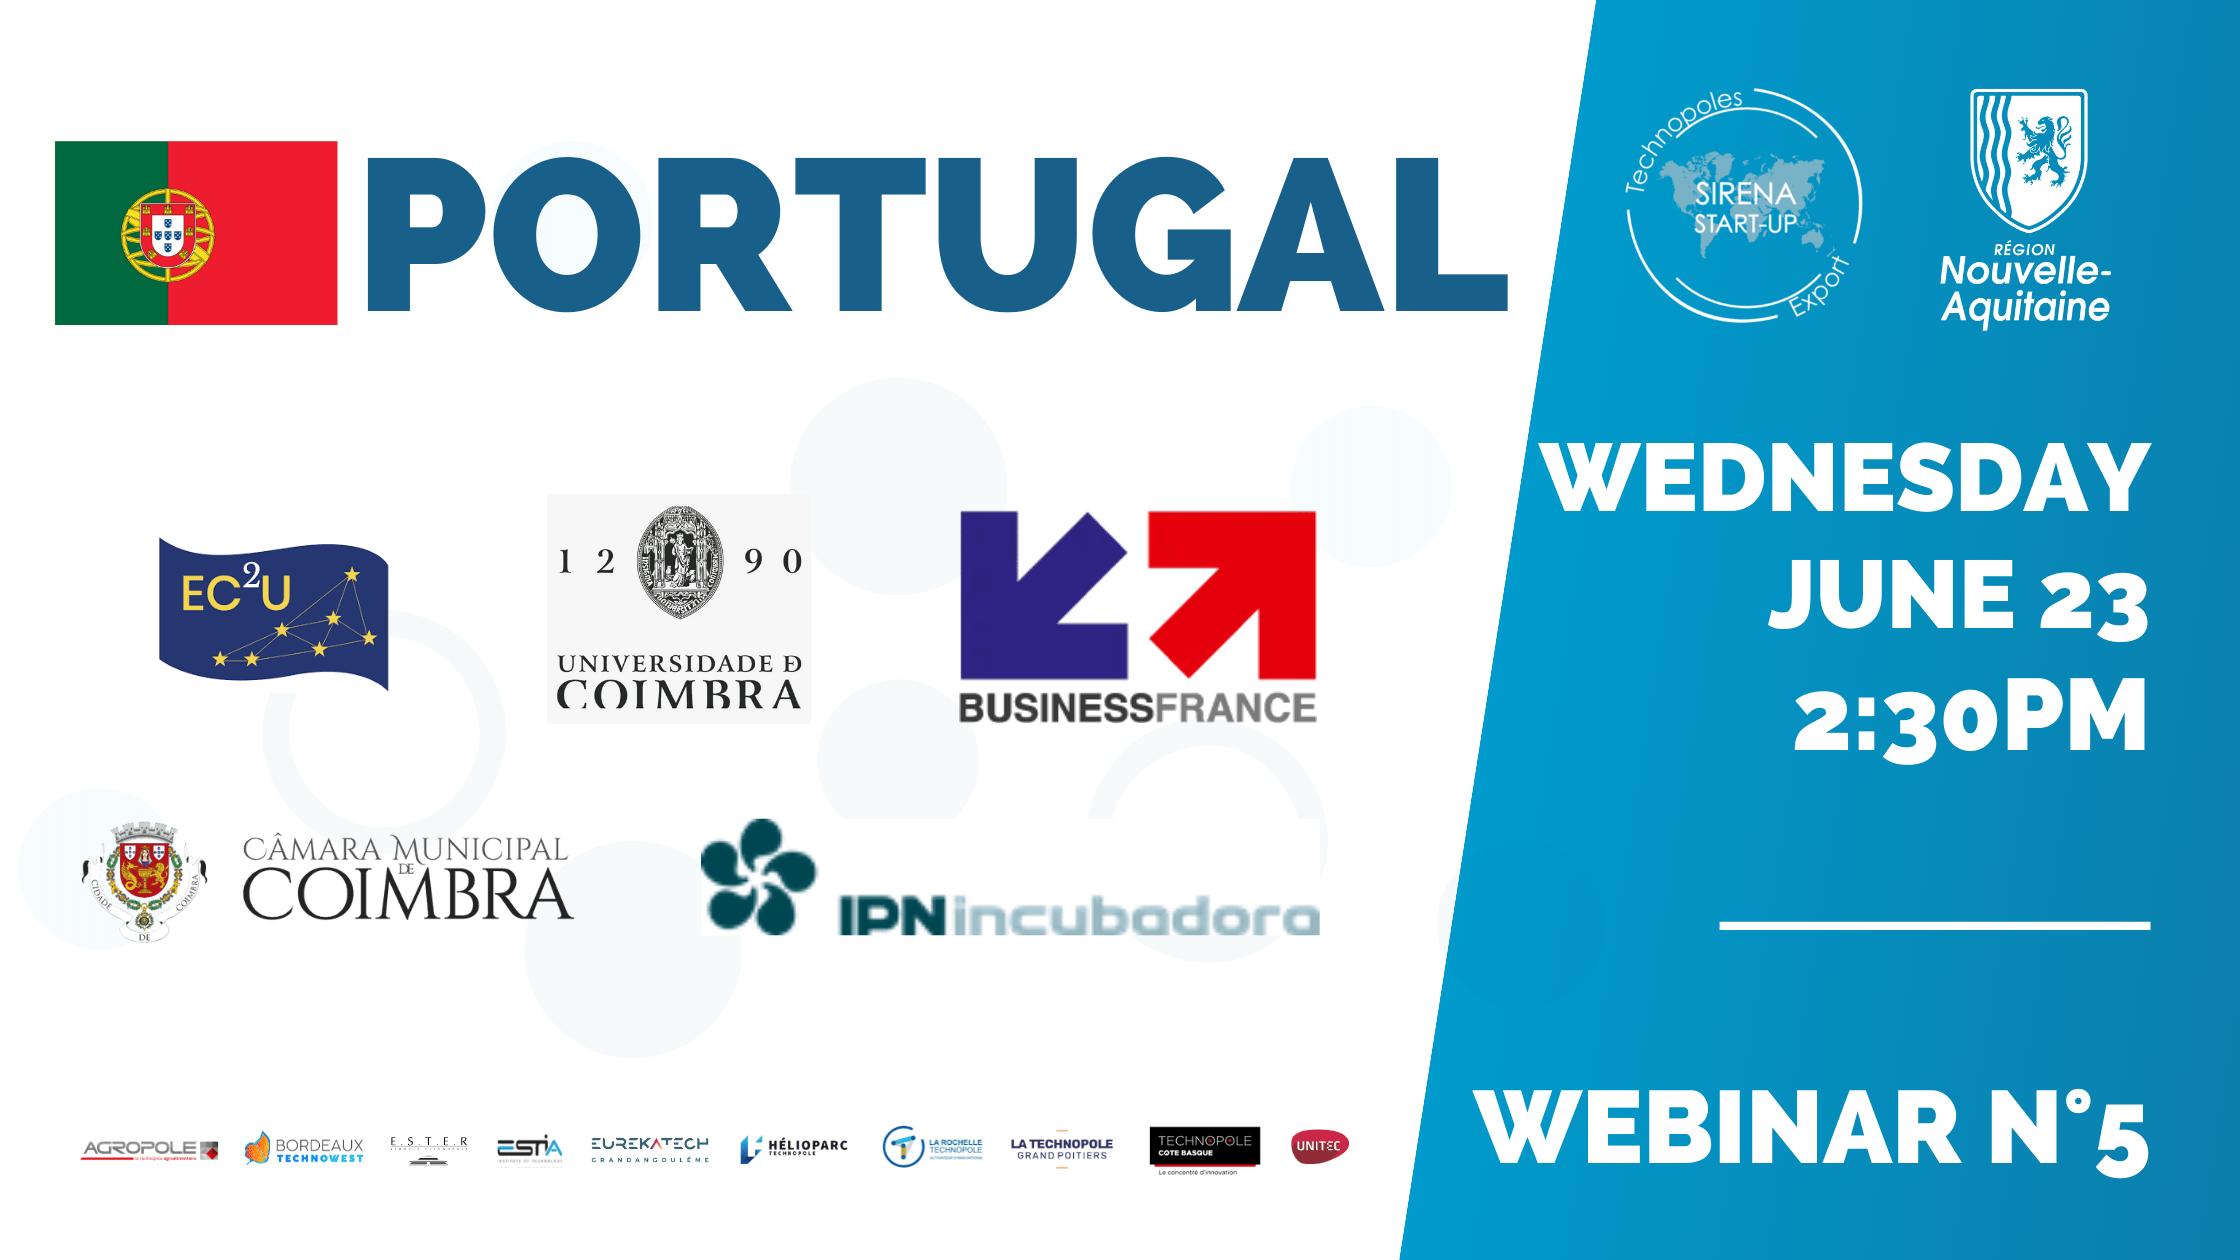 Webinar PORTUGAL (Sirena Startup)